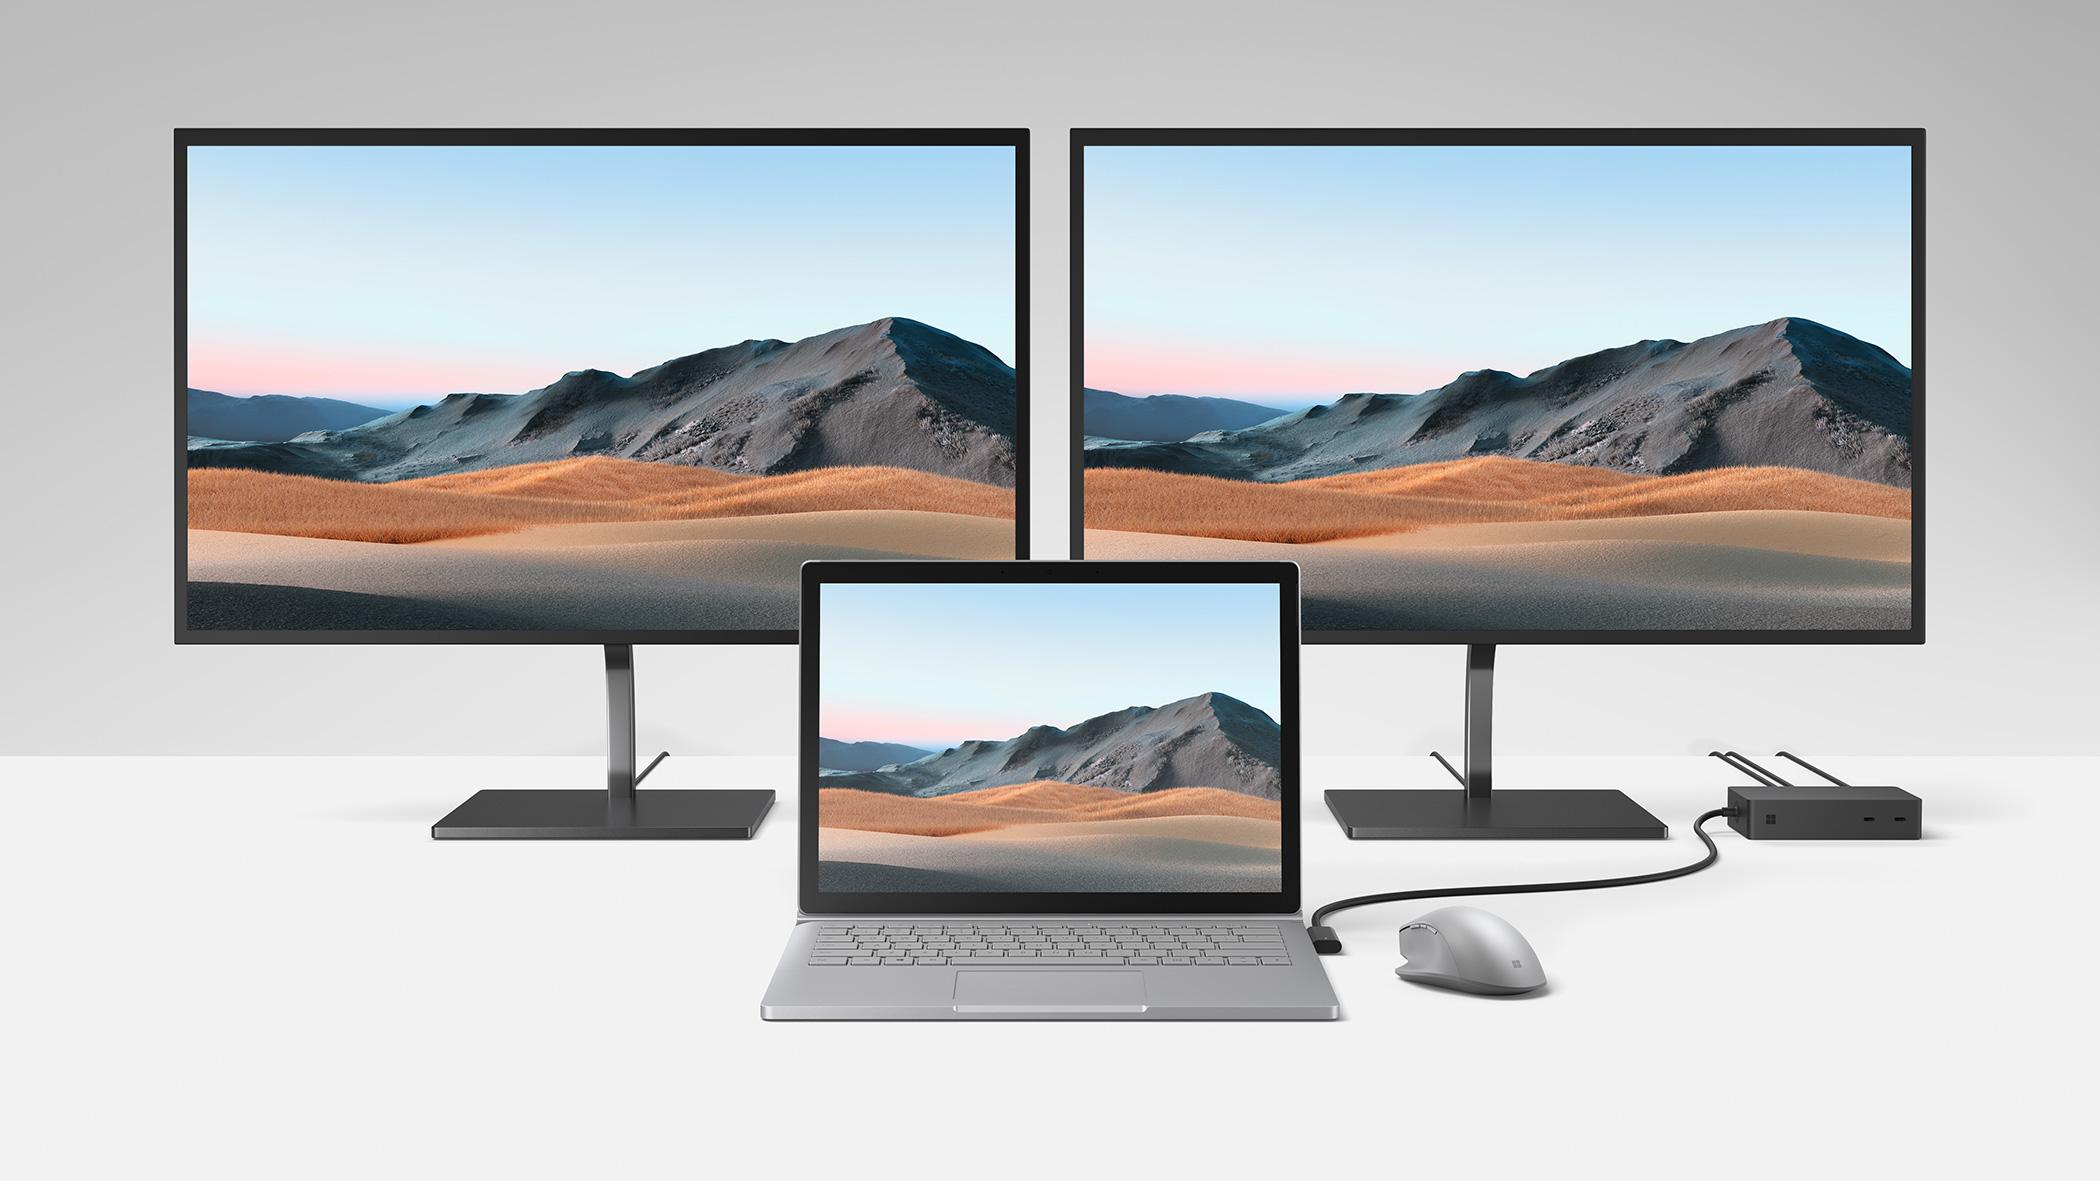 Surface Dock 2 and USB-C Travel Hub